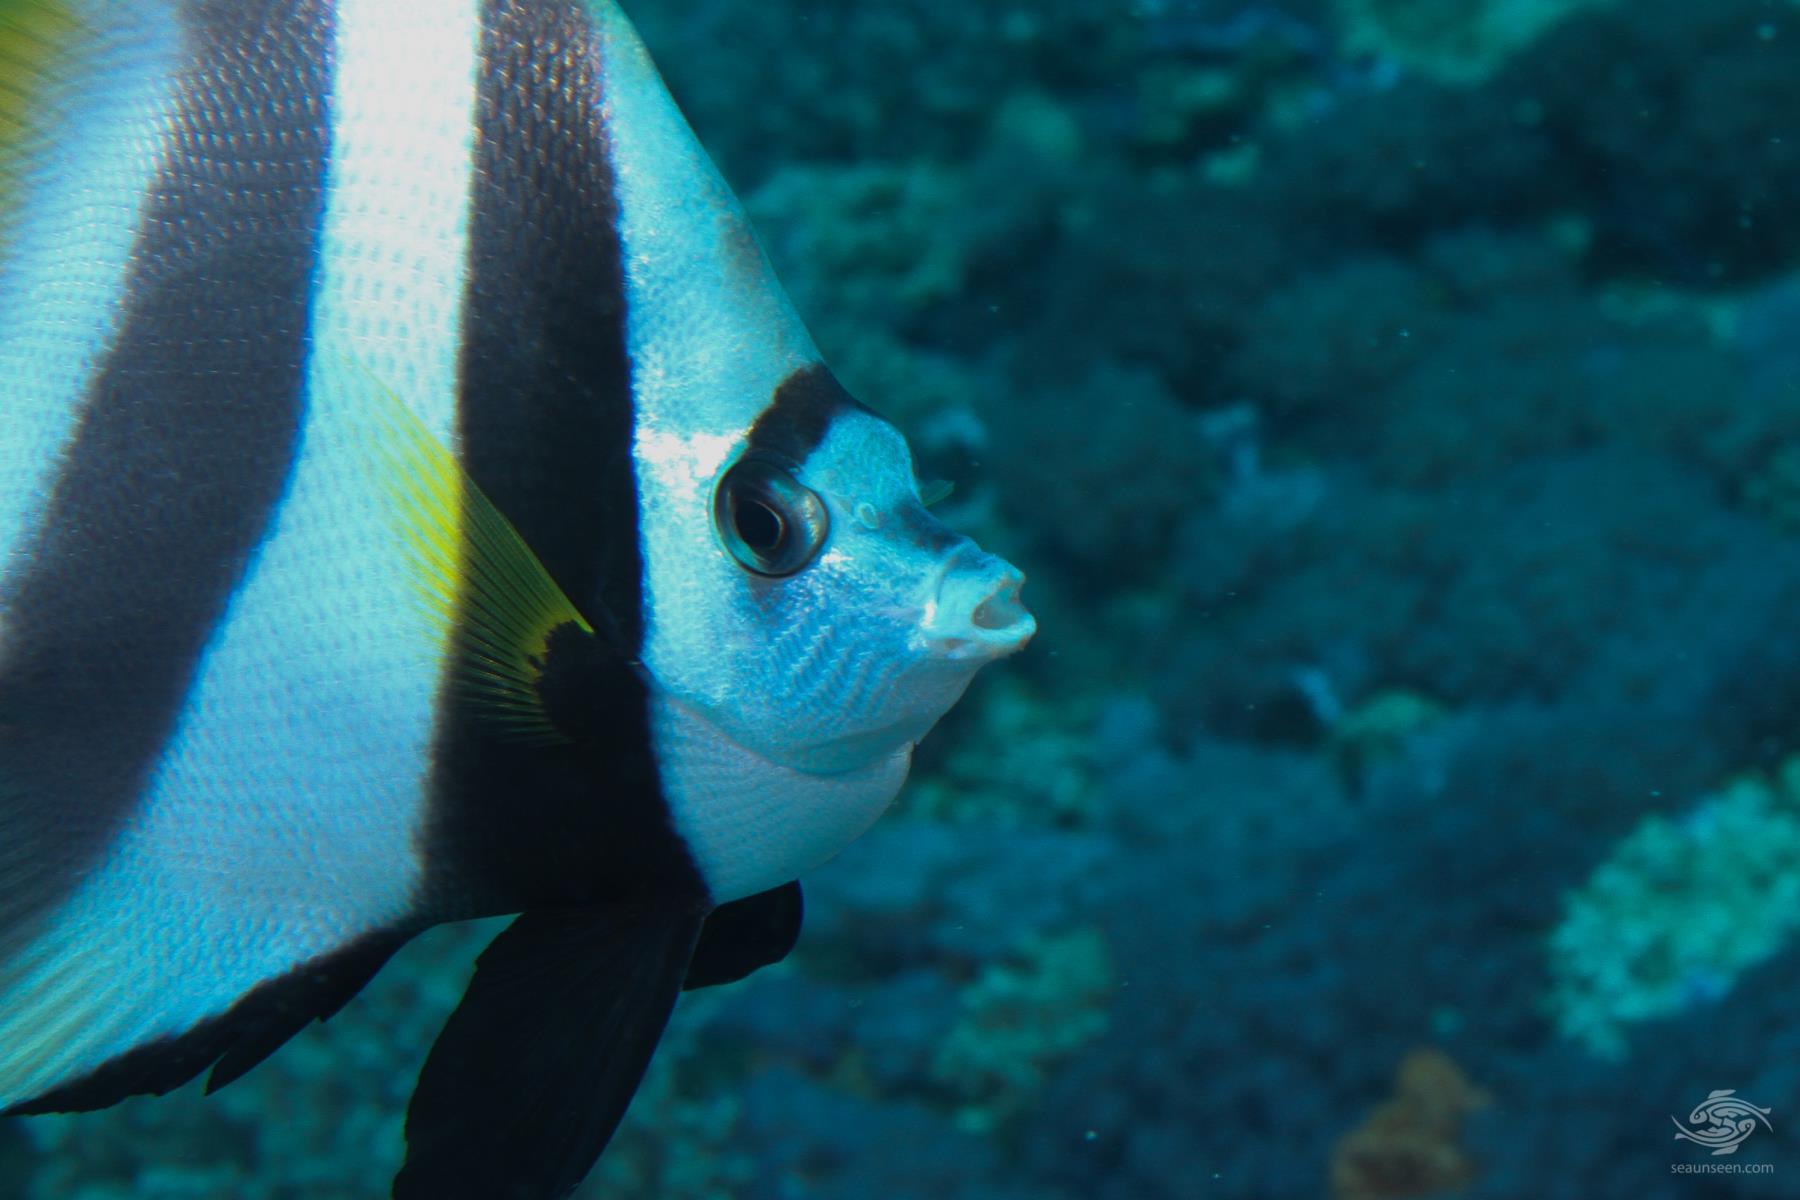 Longfin bannerfish Heniochus acuminatus